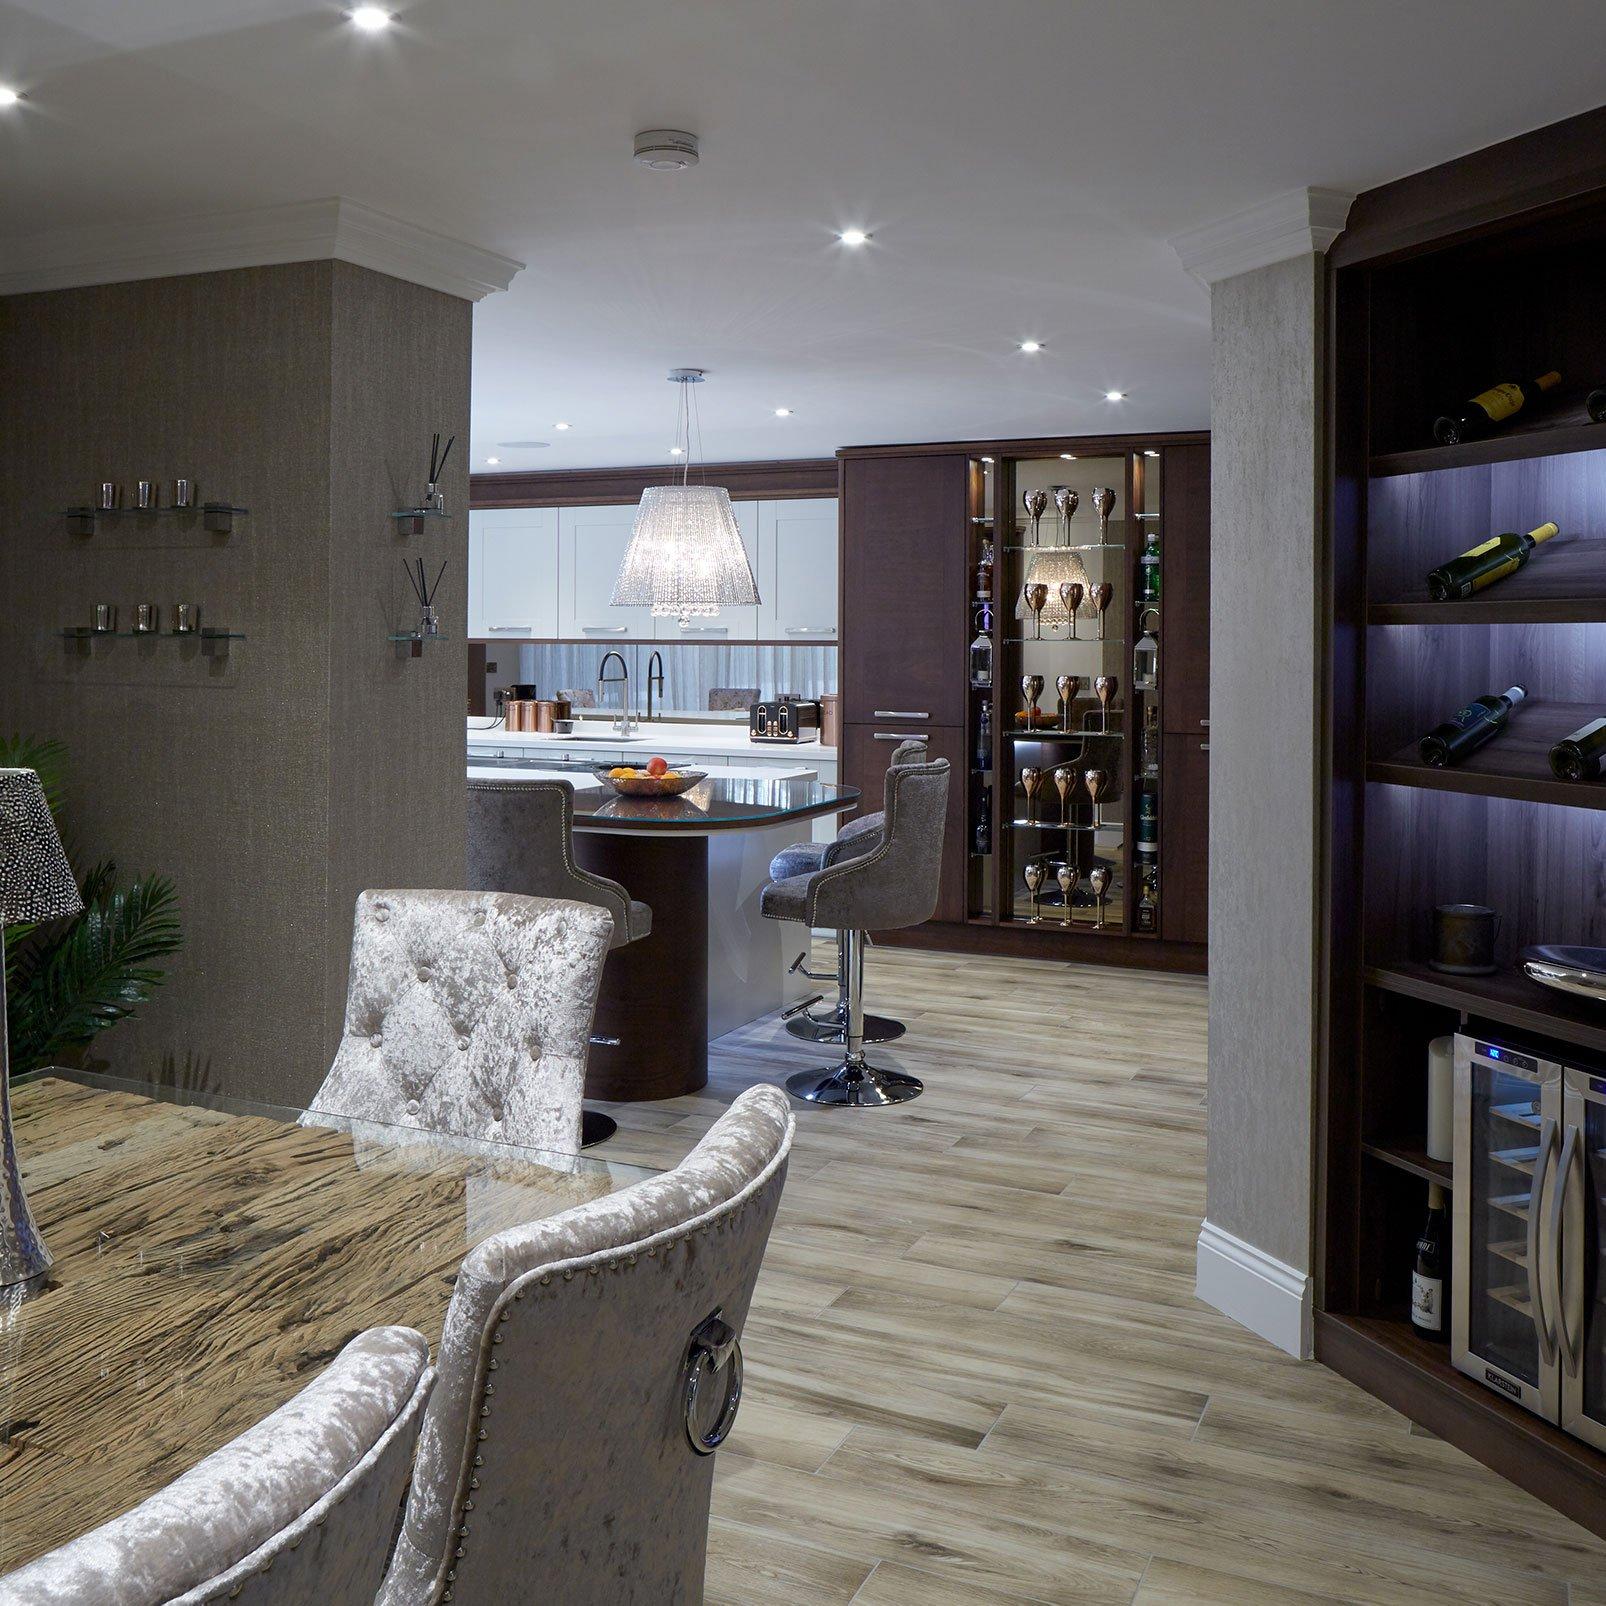 Bespoke Kitchen Design - Four